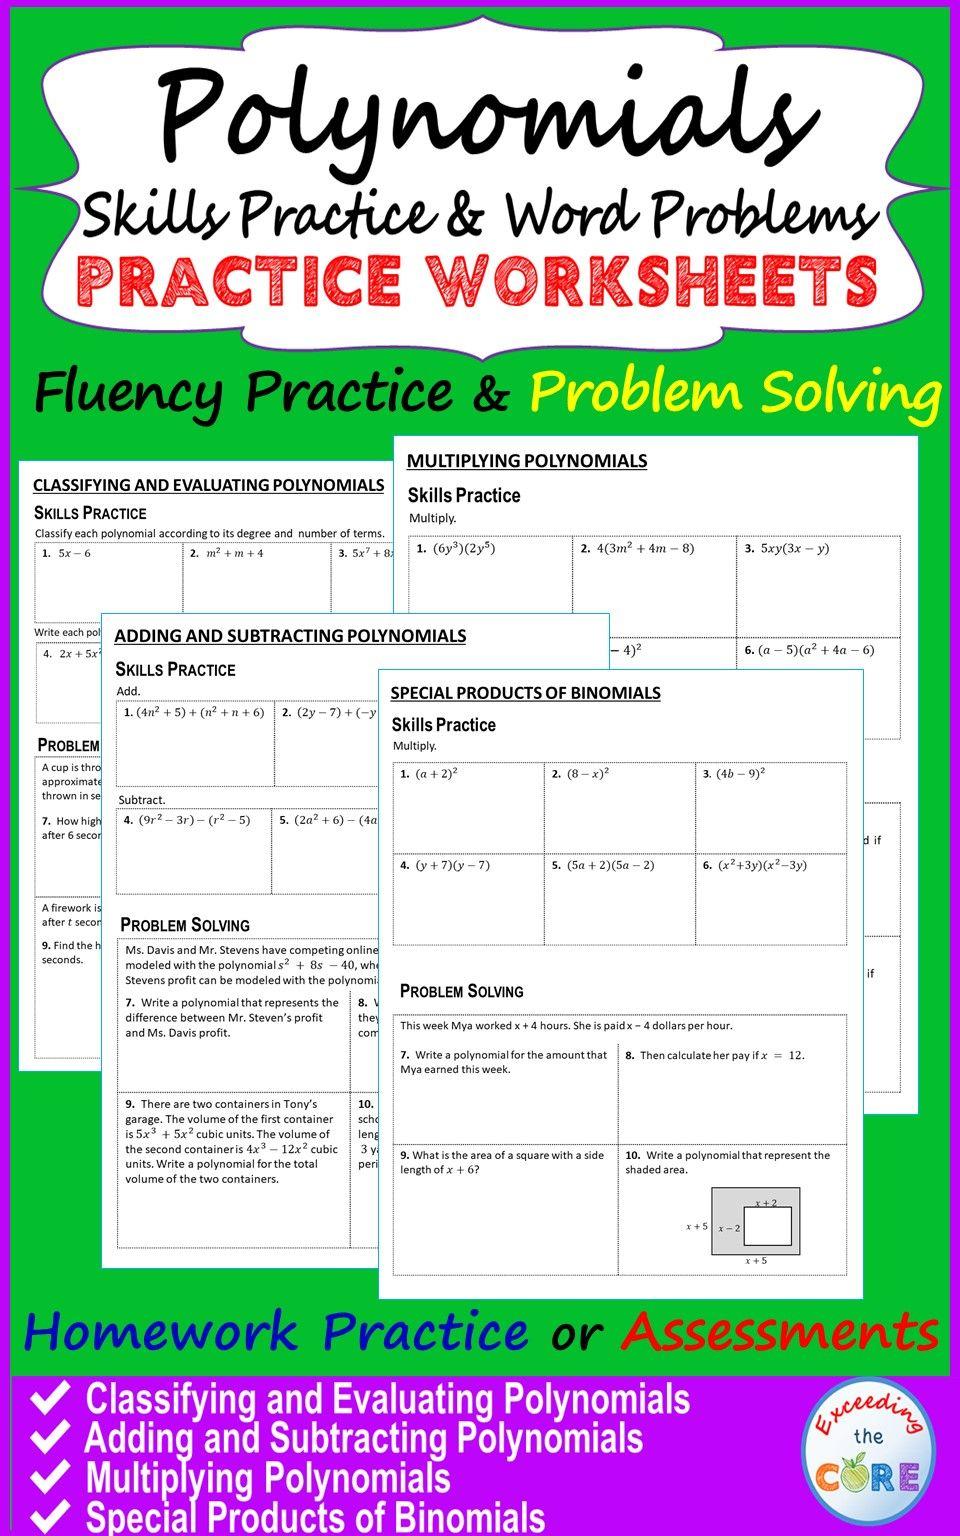 POLYNOMIALS Homework Worksheets Skills Practice & Word